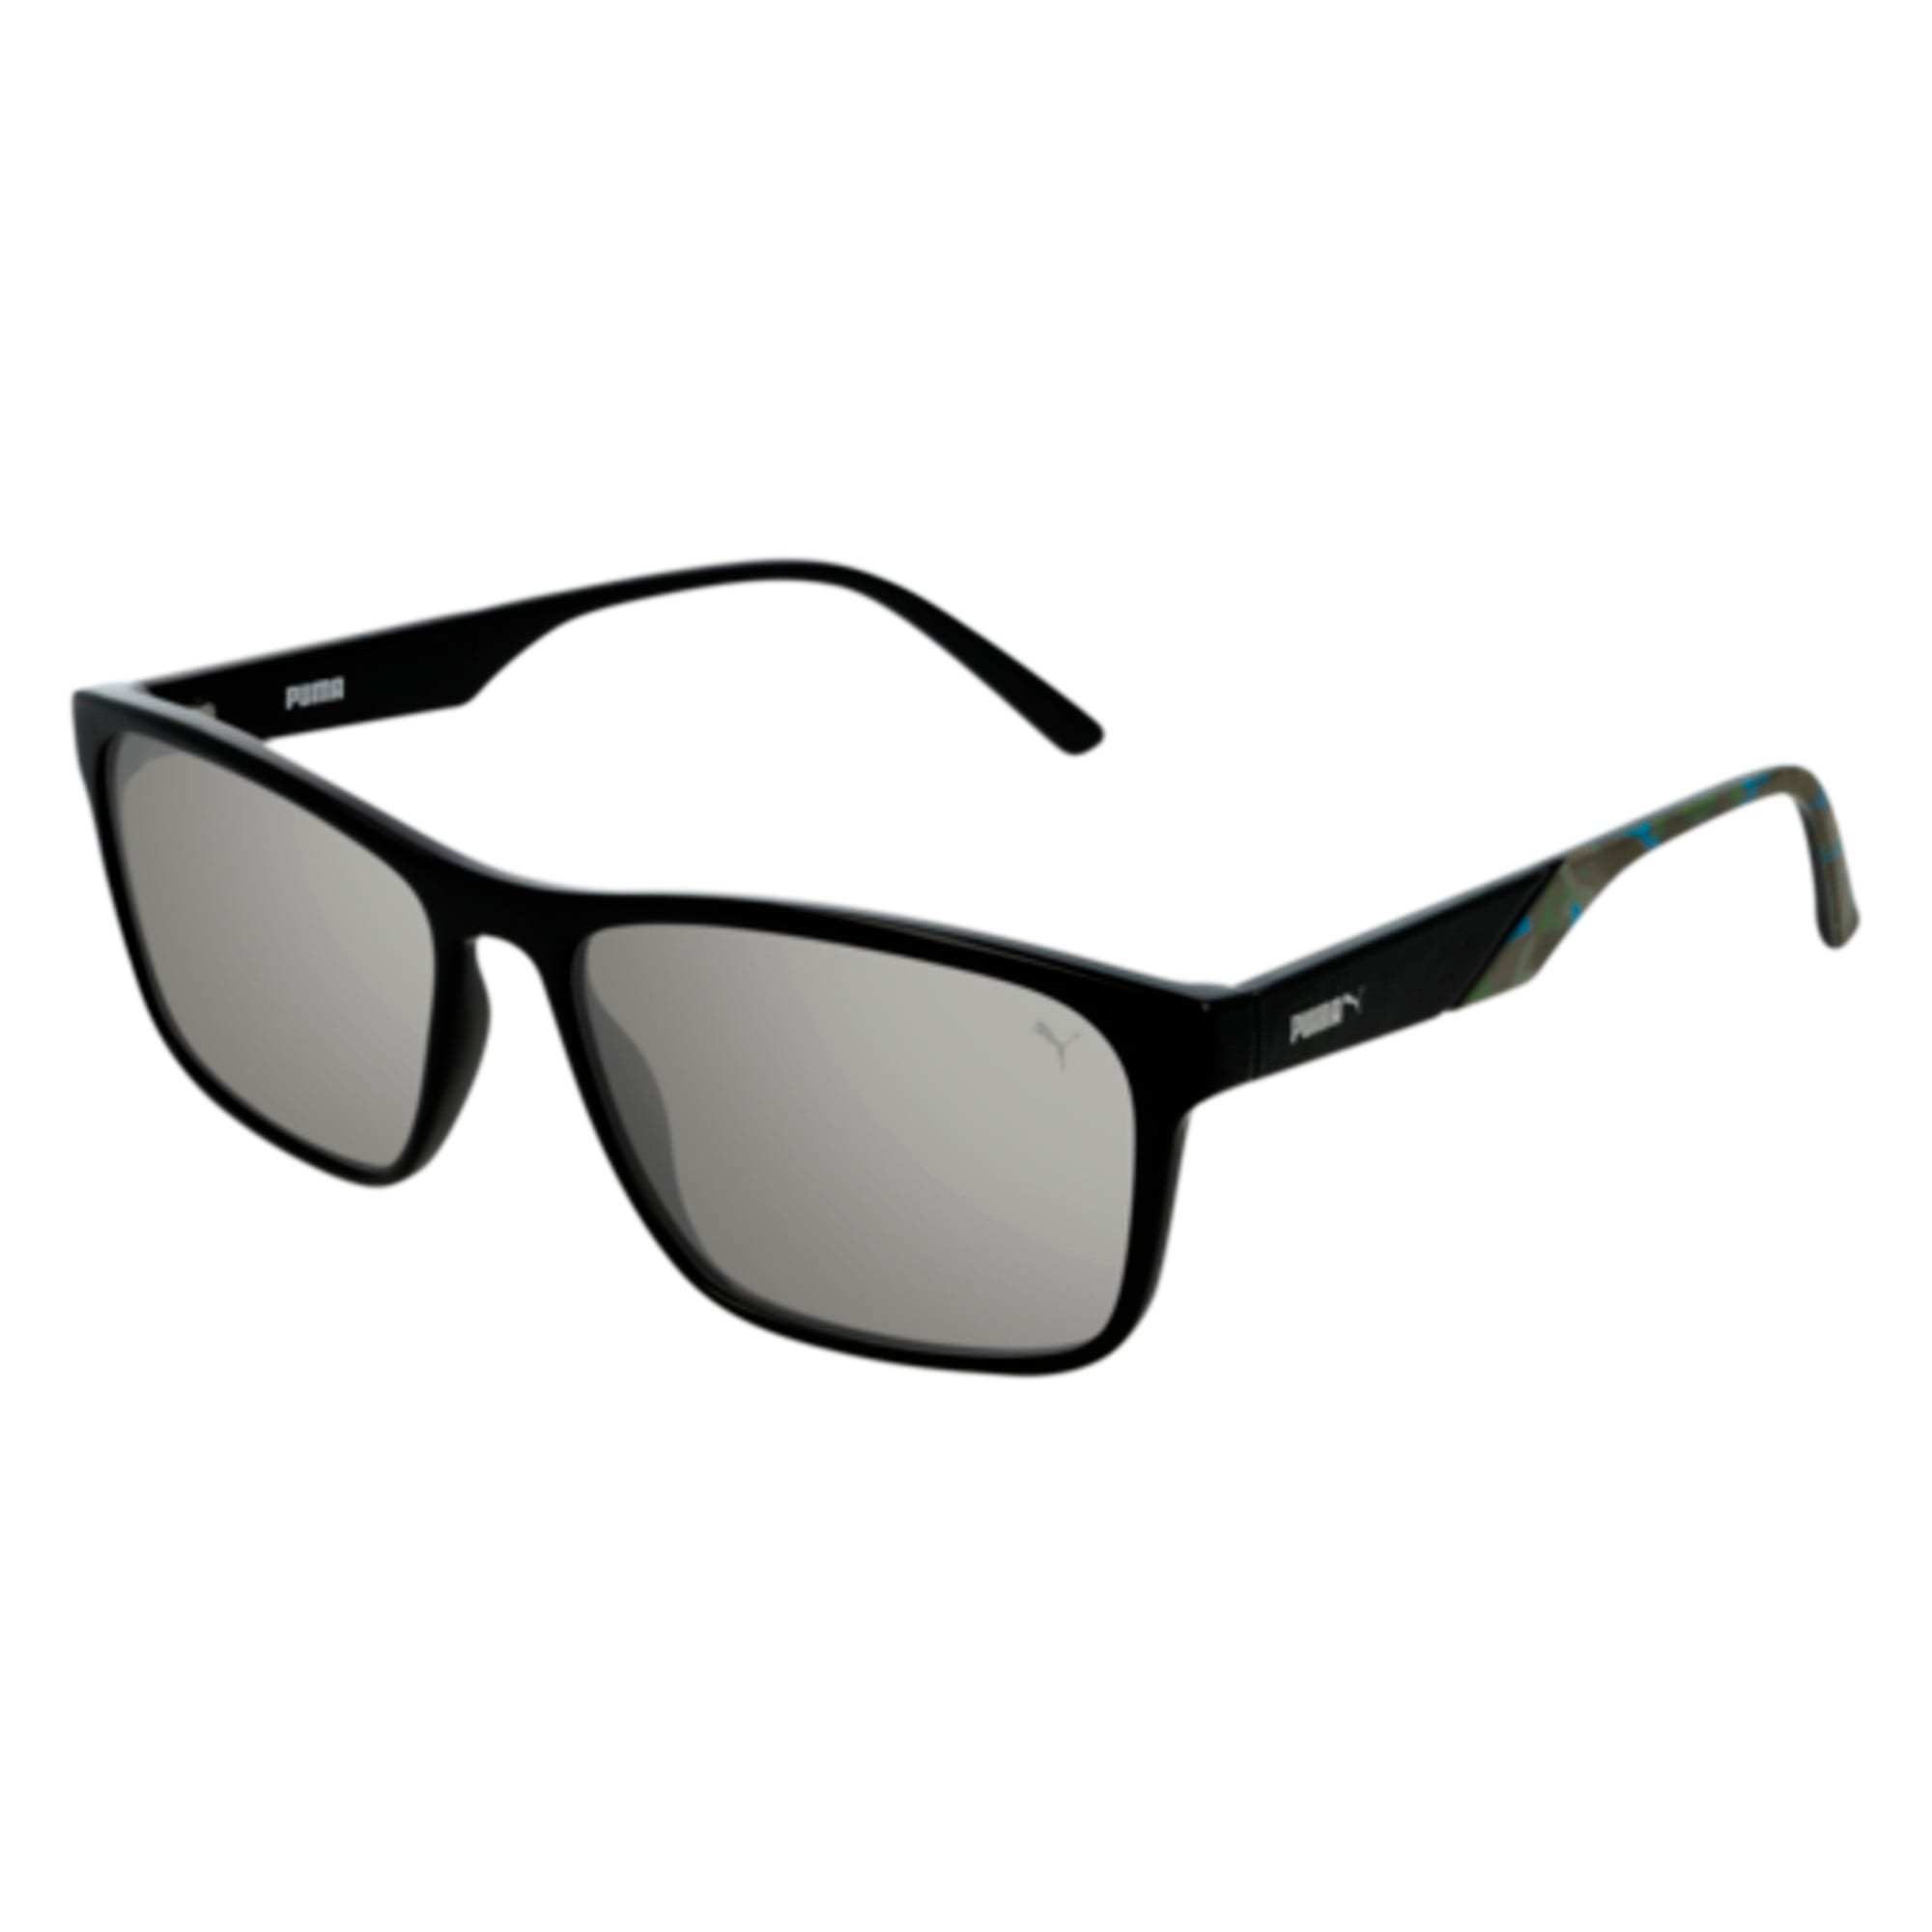 Thumbnail 1 of PUMA Classic Rectangle Sunglasses, BLACK, medium